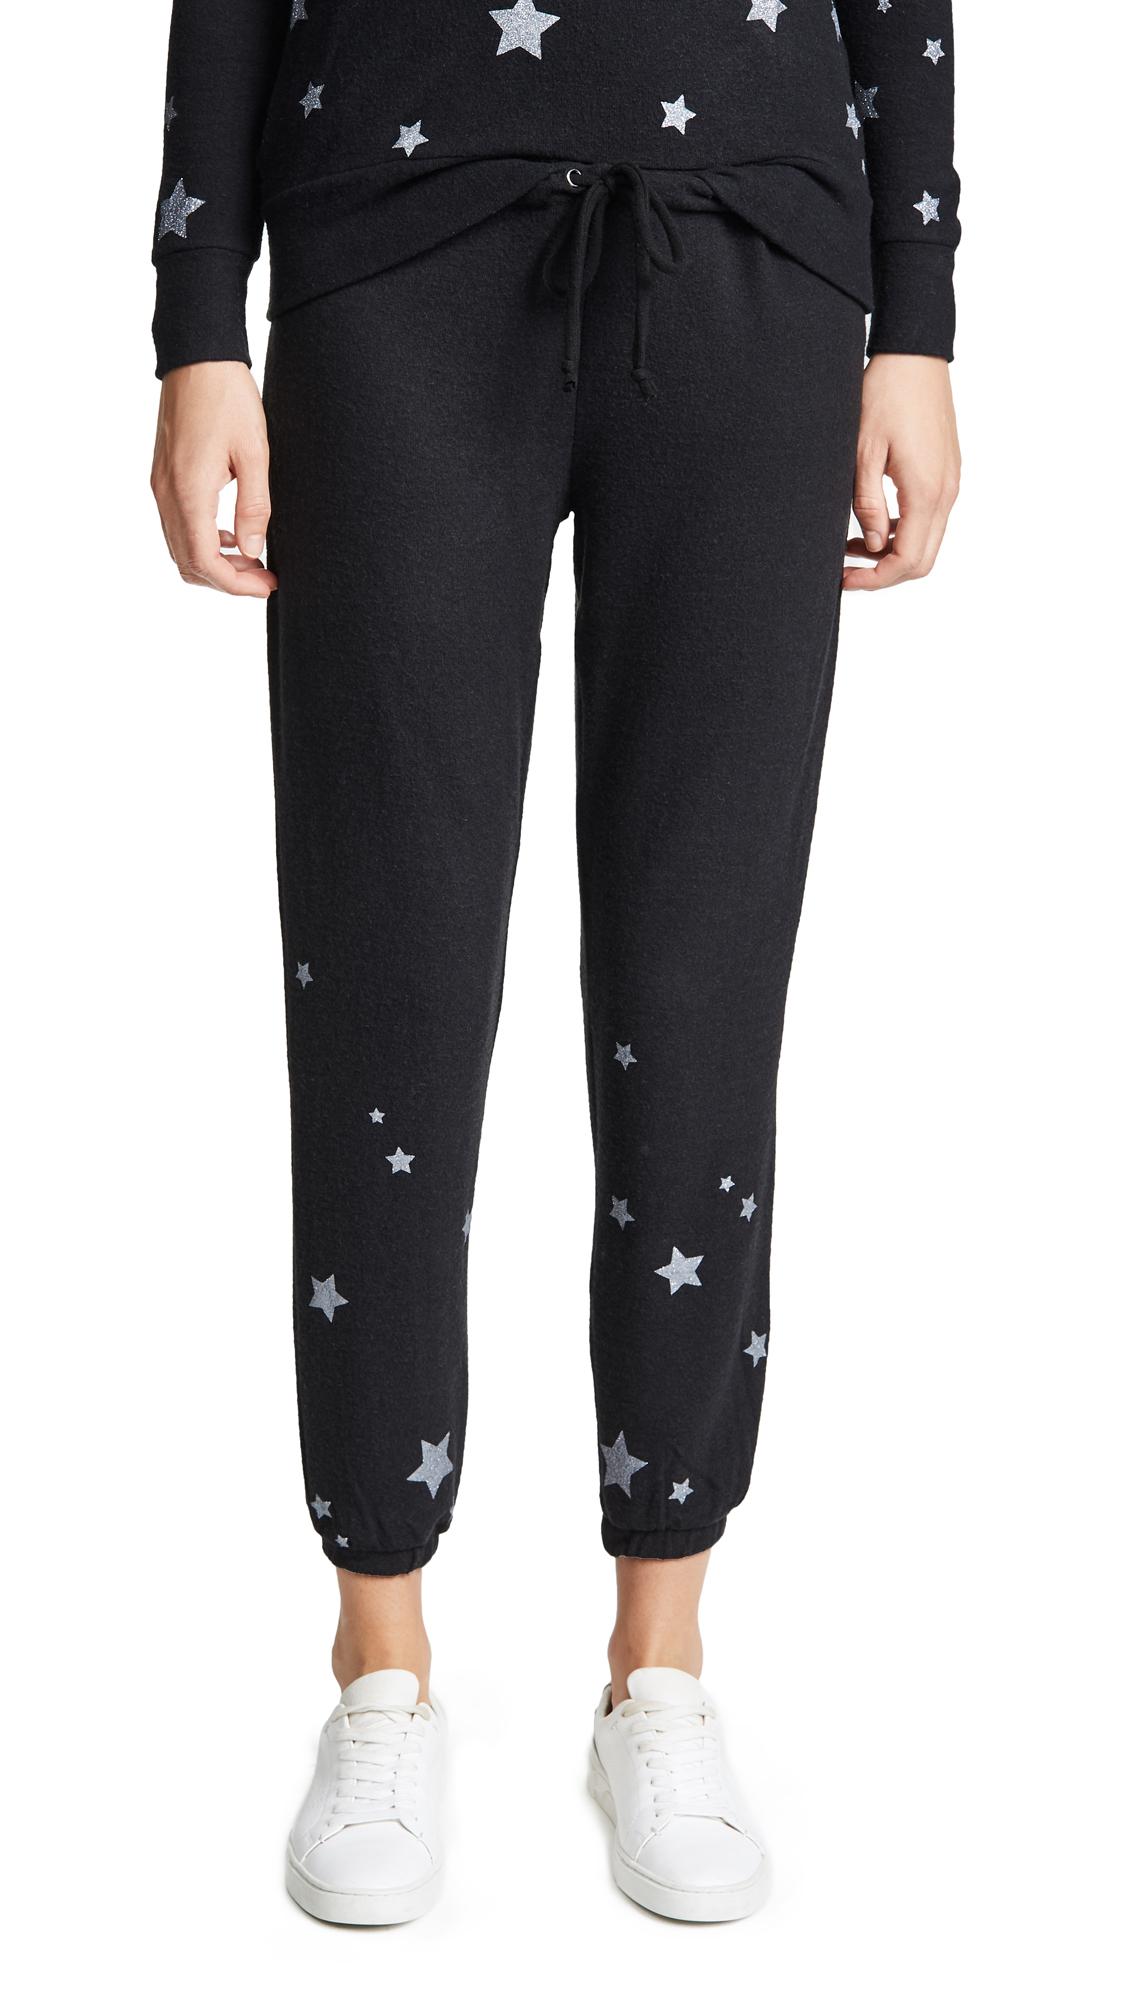 Starry Pant Sweats, True Black